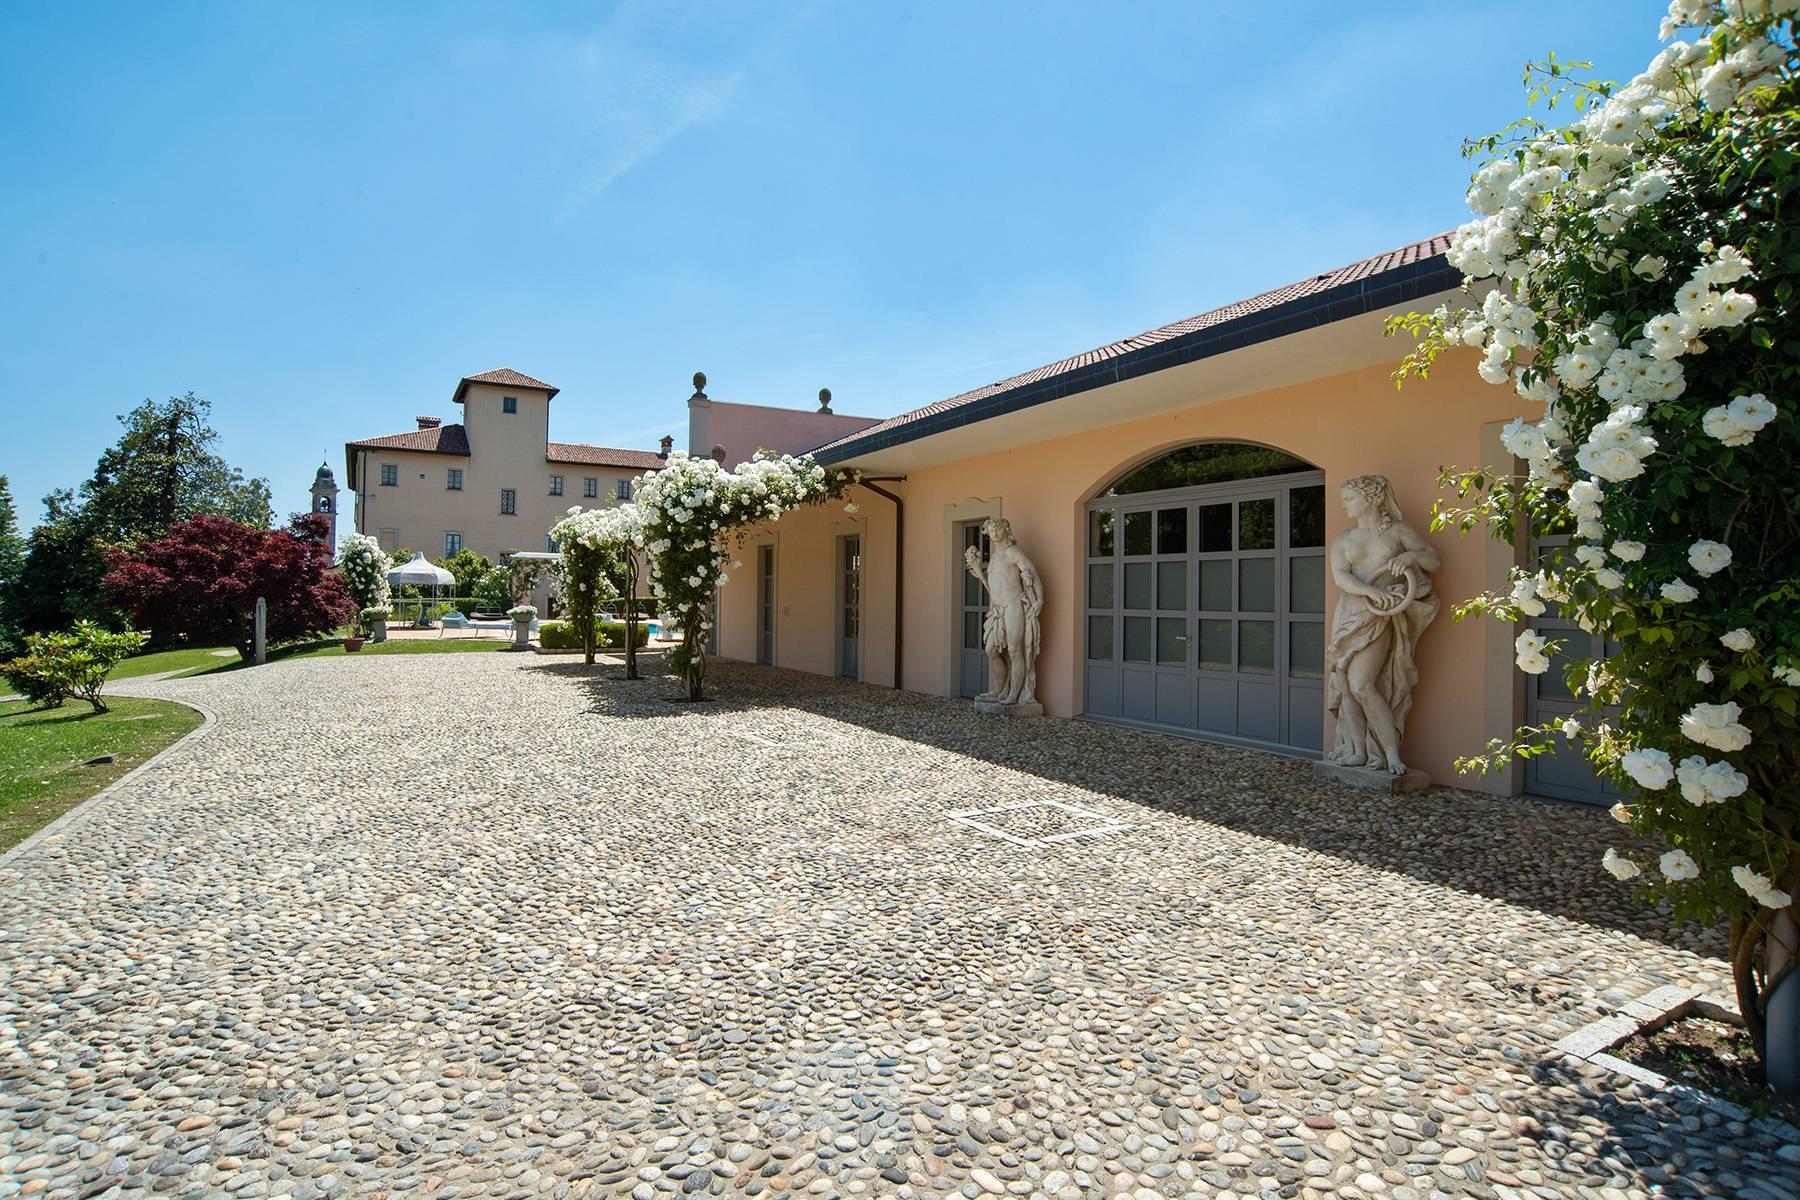 Antico Borgo Piemontese a due passi dal lago Maggiore - 23